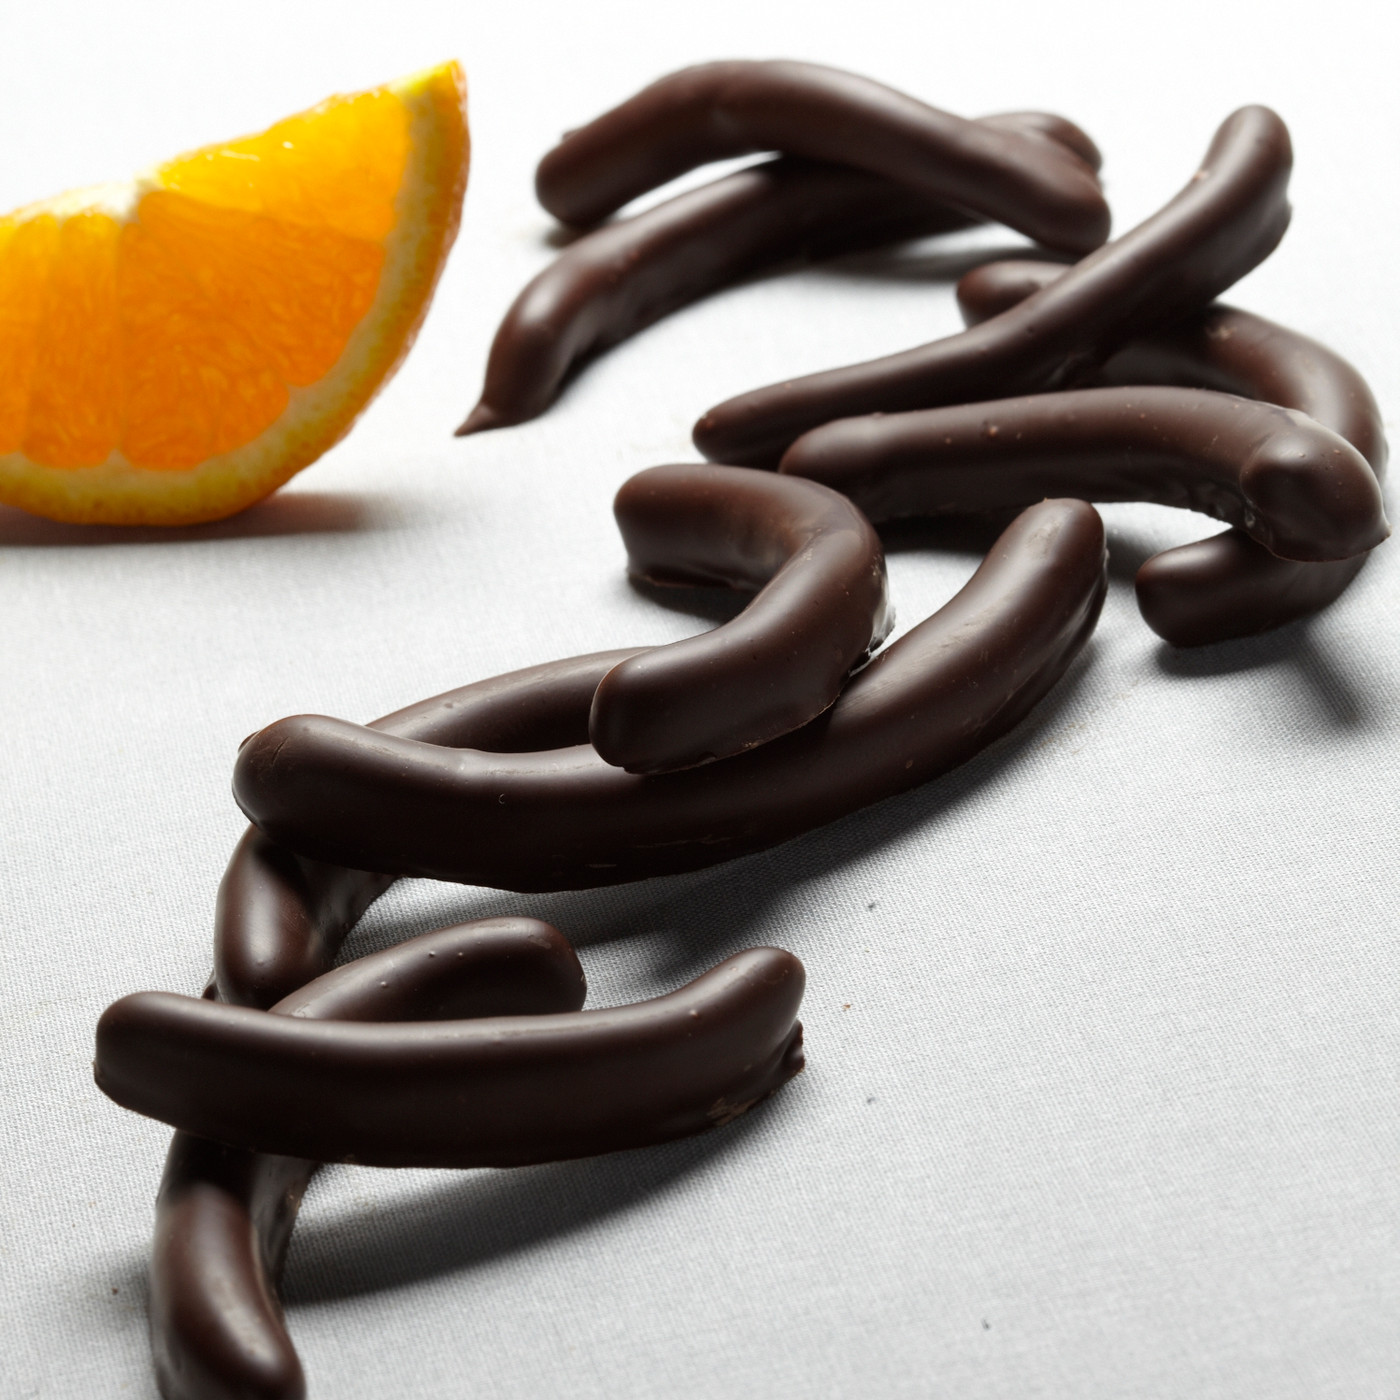 Orangette Ballotin